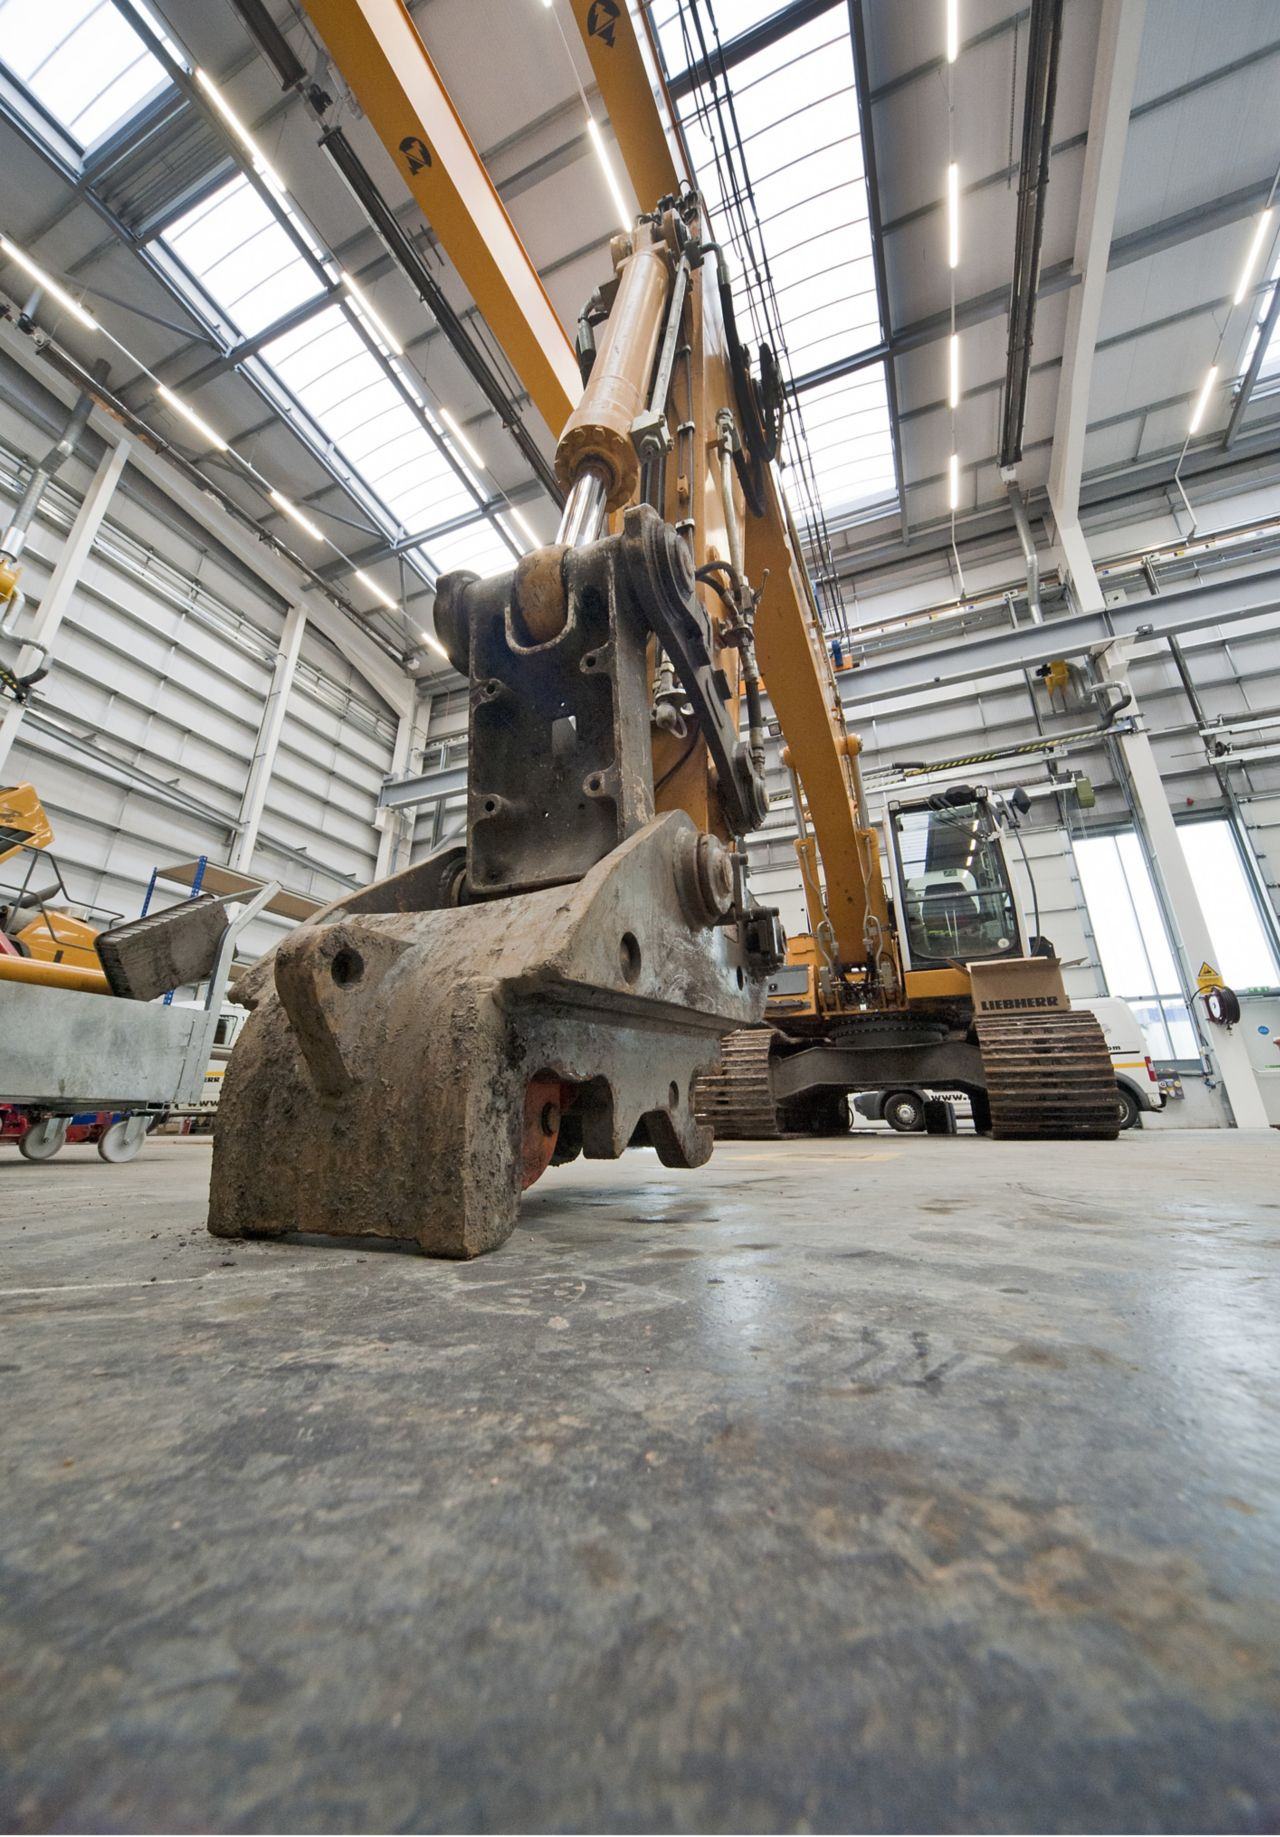 Excavator on a concrete floor with dry shake aggregate floor hardeners